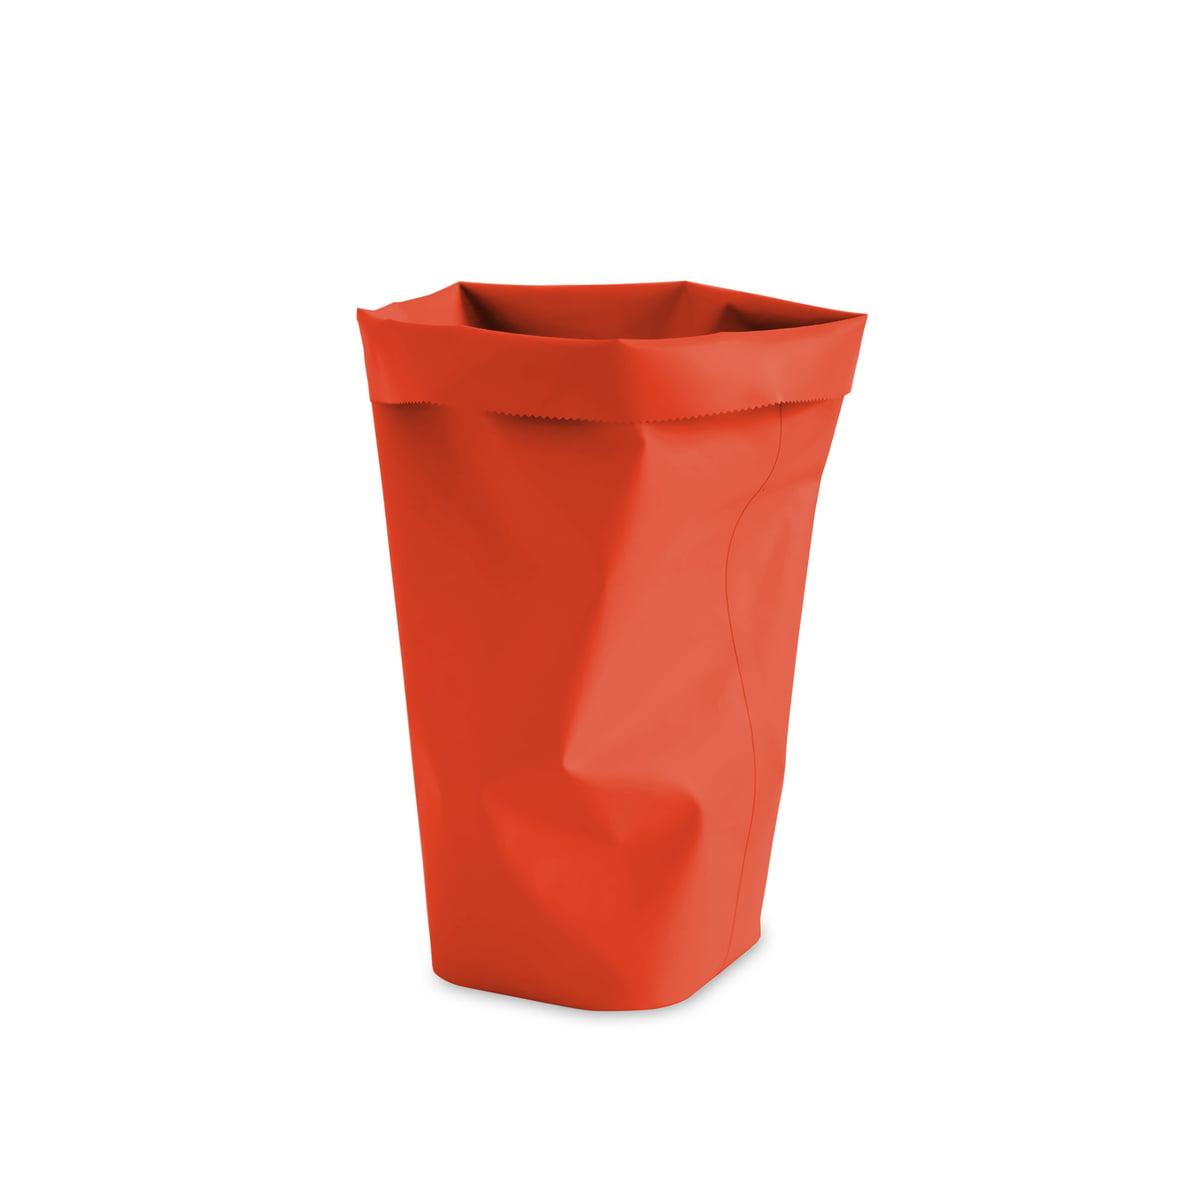 L&Z - Roll-Up Papierkorb M, blutorange | Büro | Blutorange | Tpu (100 % pvc-frei) | L&Z